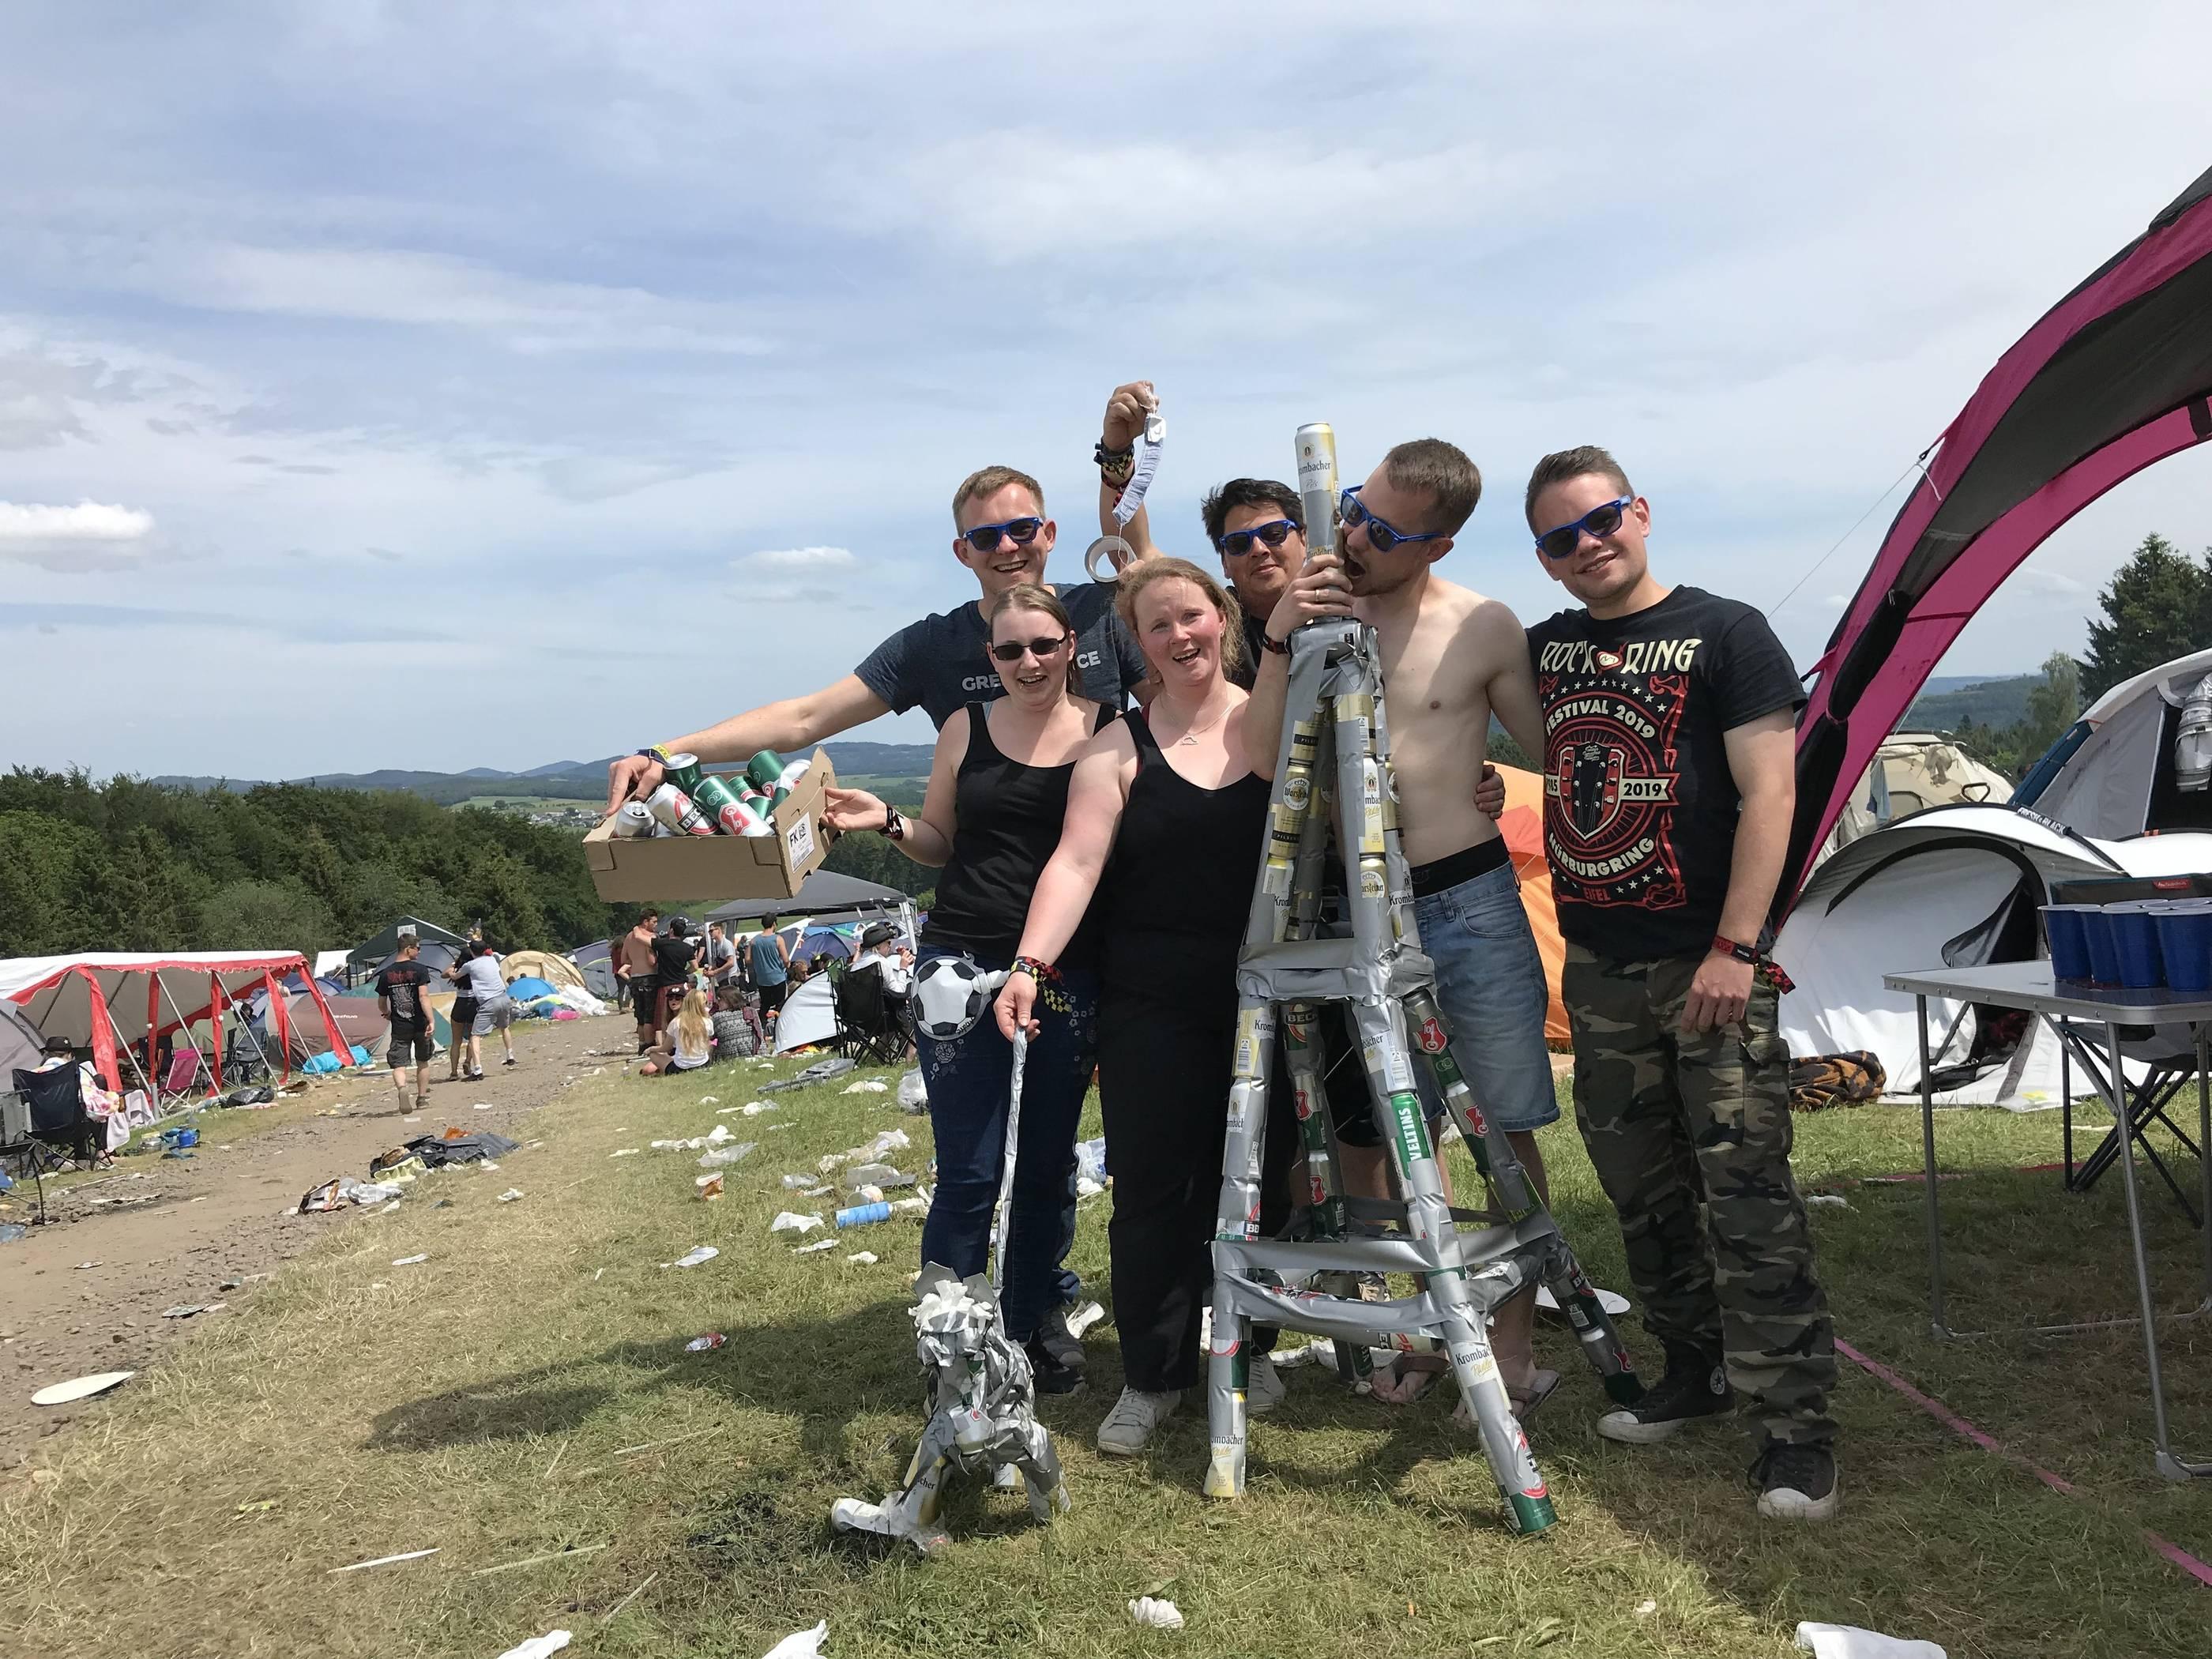 Rock Am Ring 2019 Party Auf Den Campingplätzen